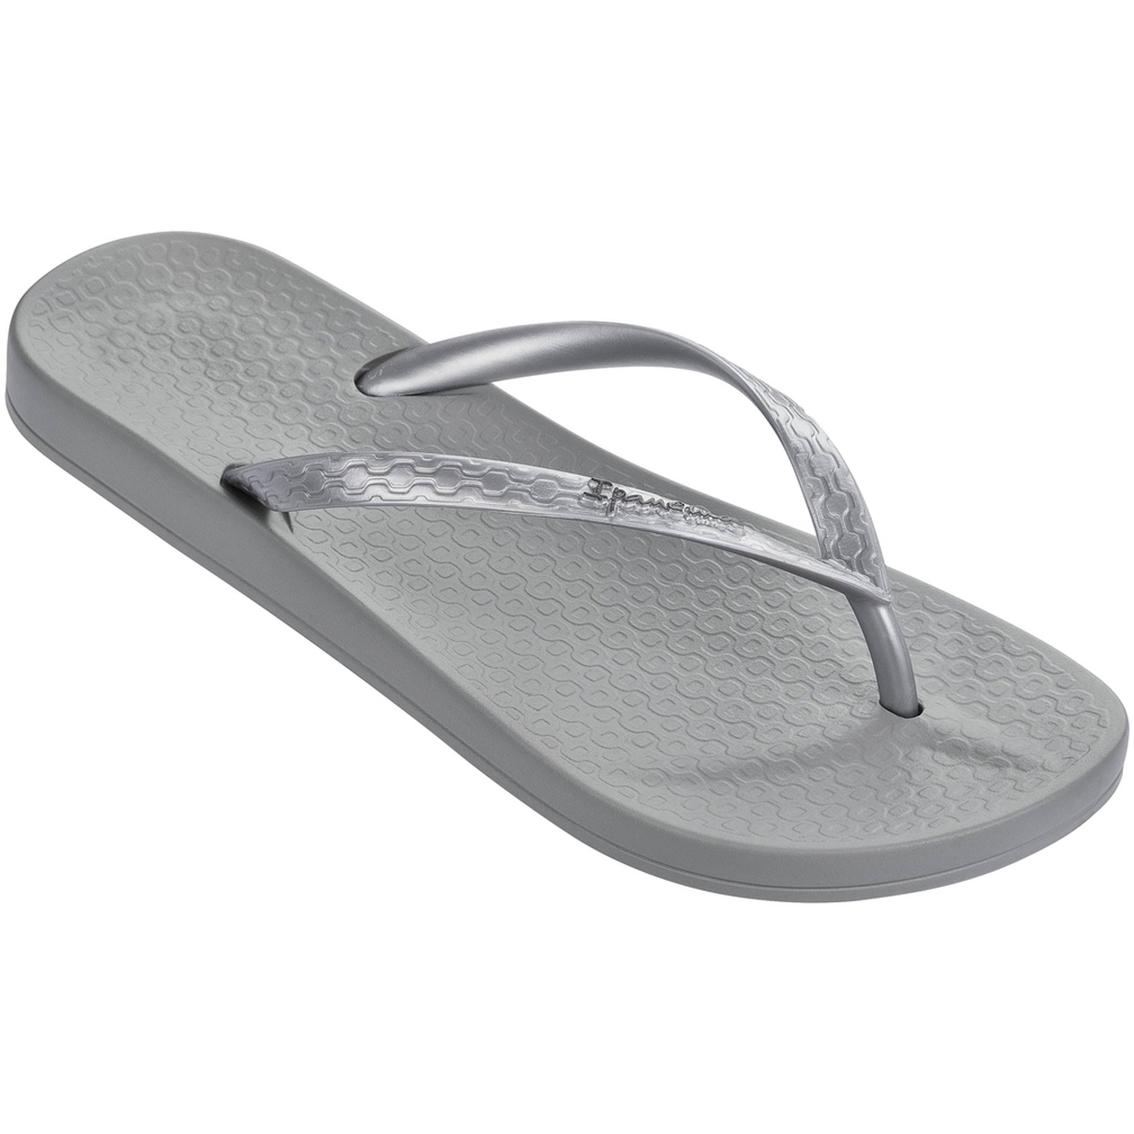 2495132f559 Ipanema Ana Tan Basic Gray Thong Sandals